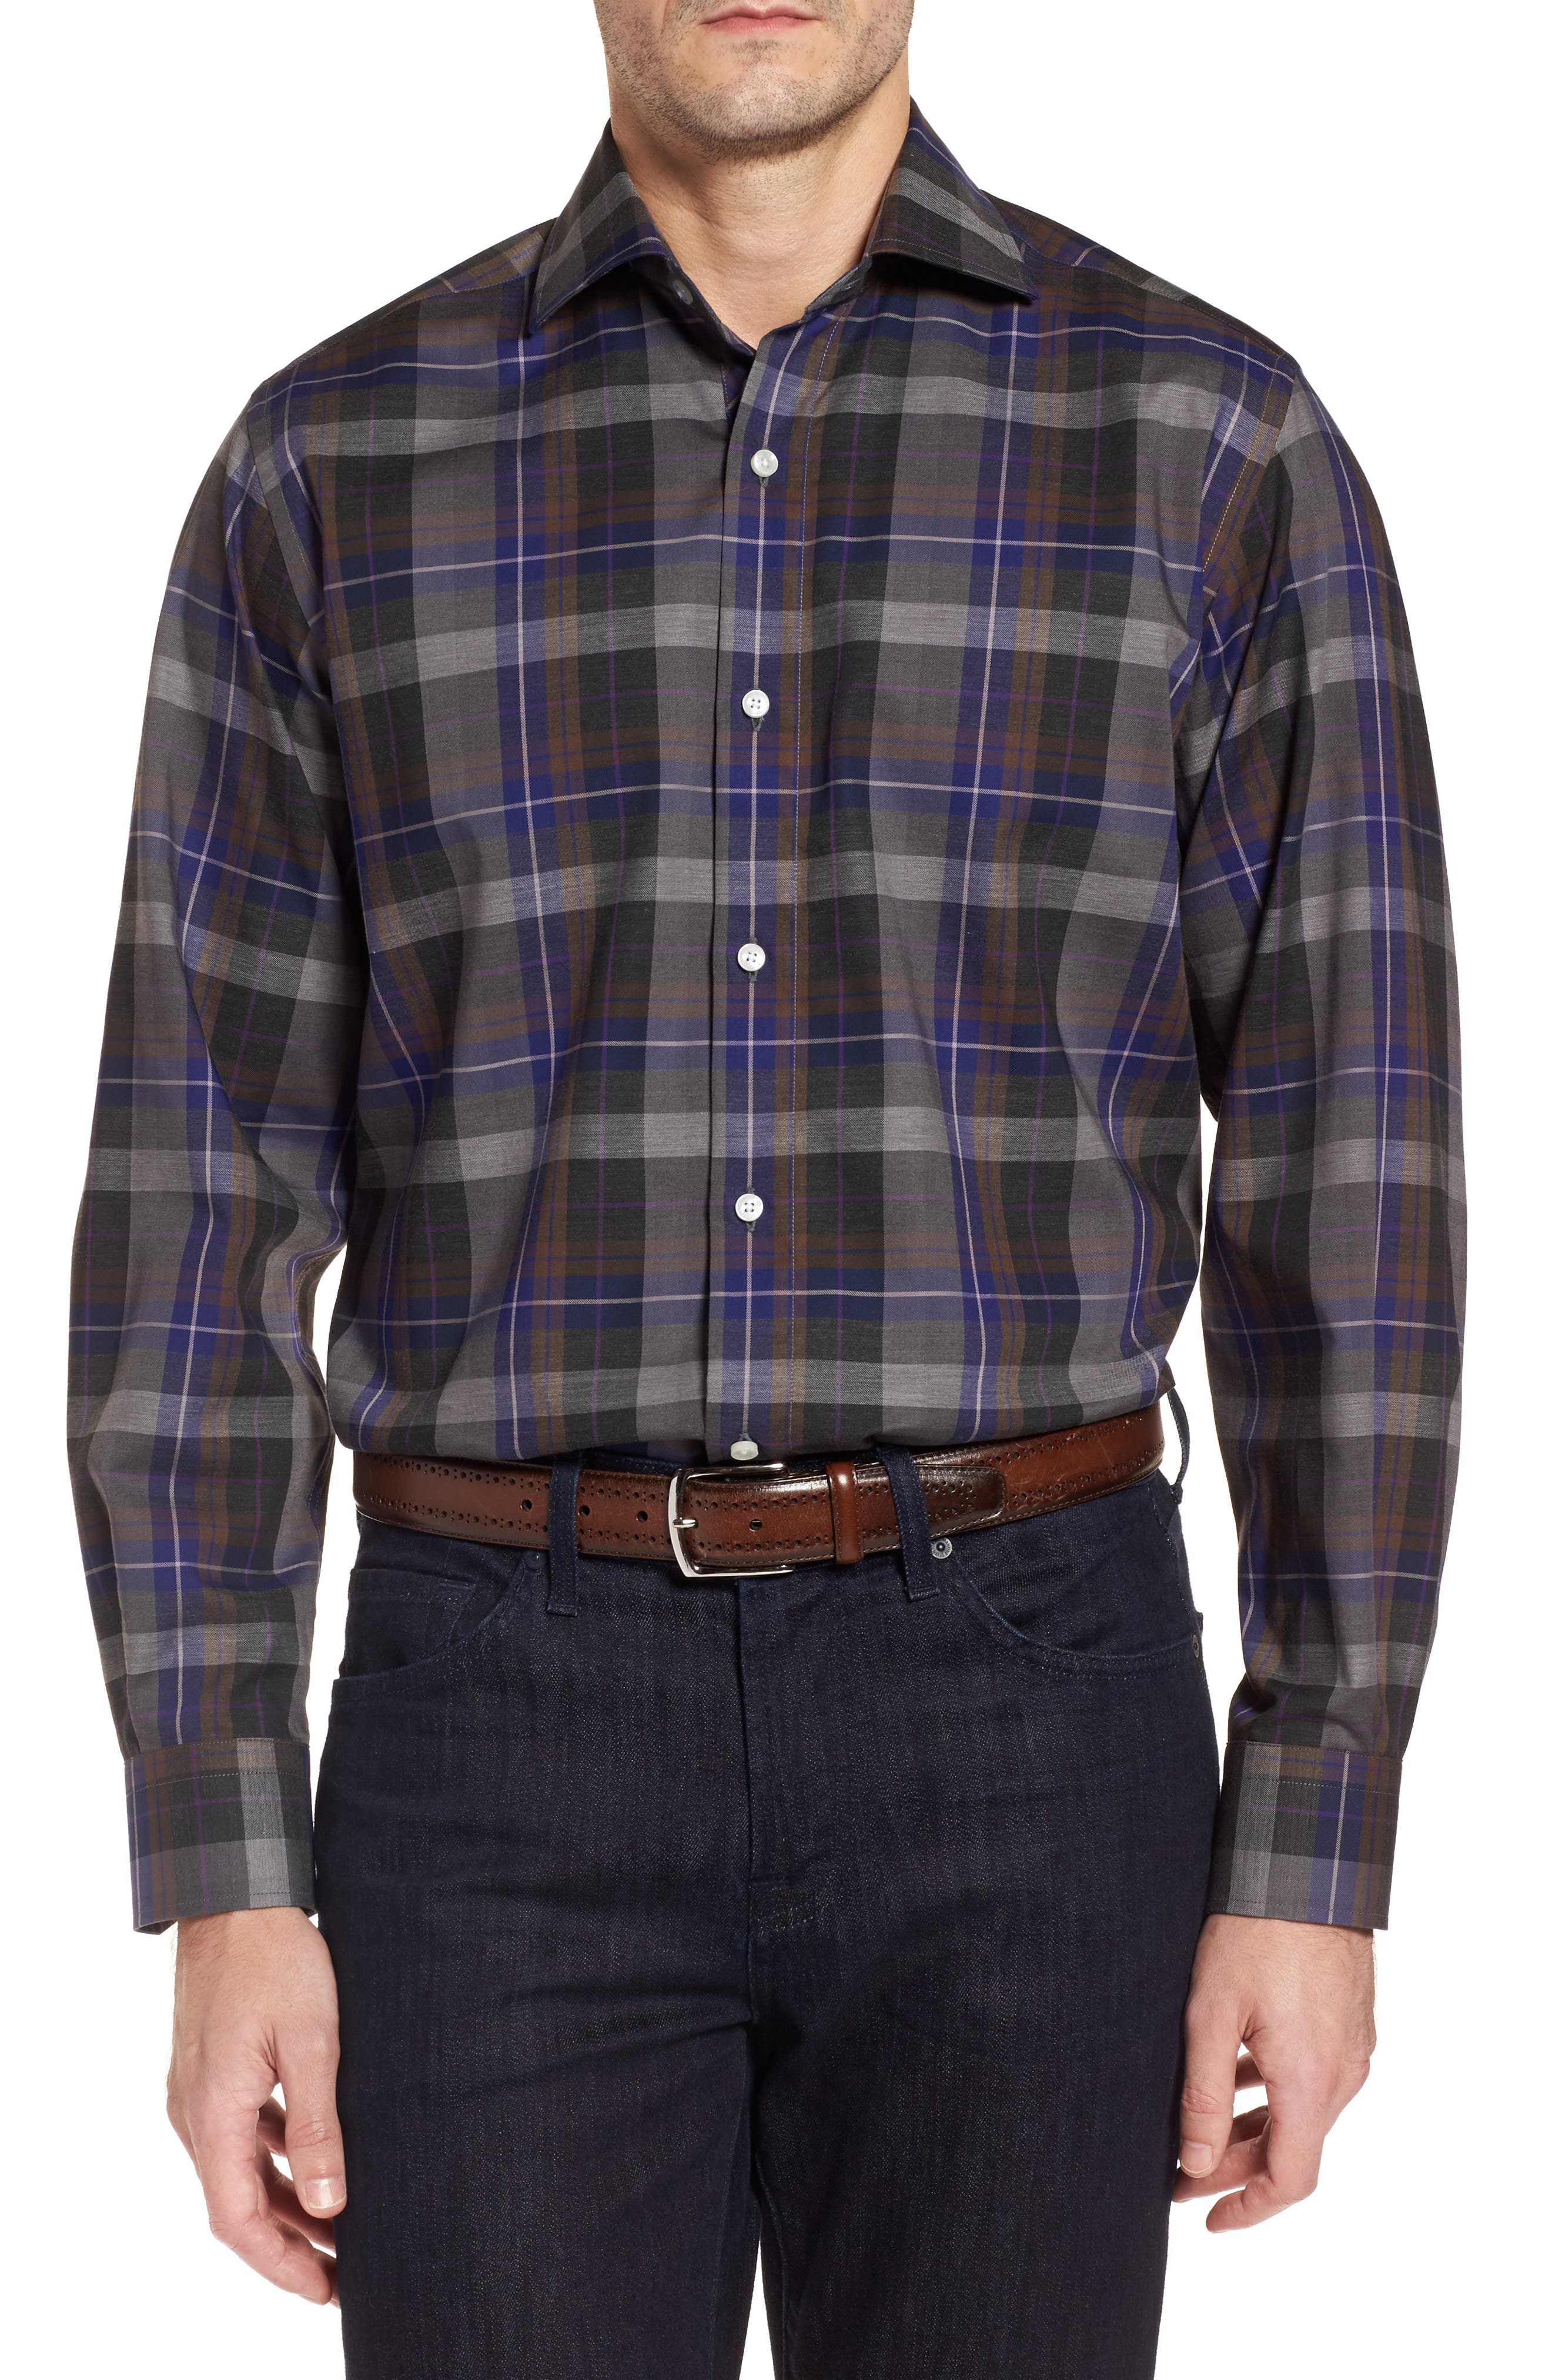 TailorByrd Cullen Plaid Twill Sport Shirt